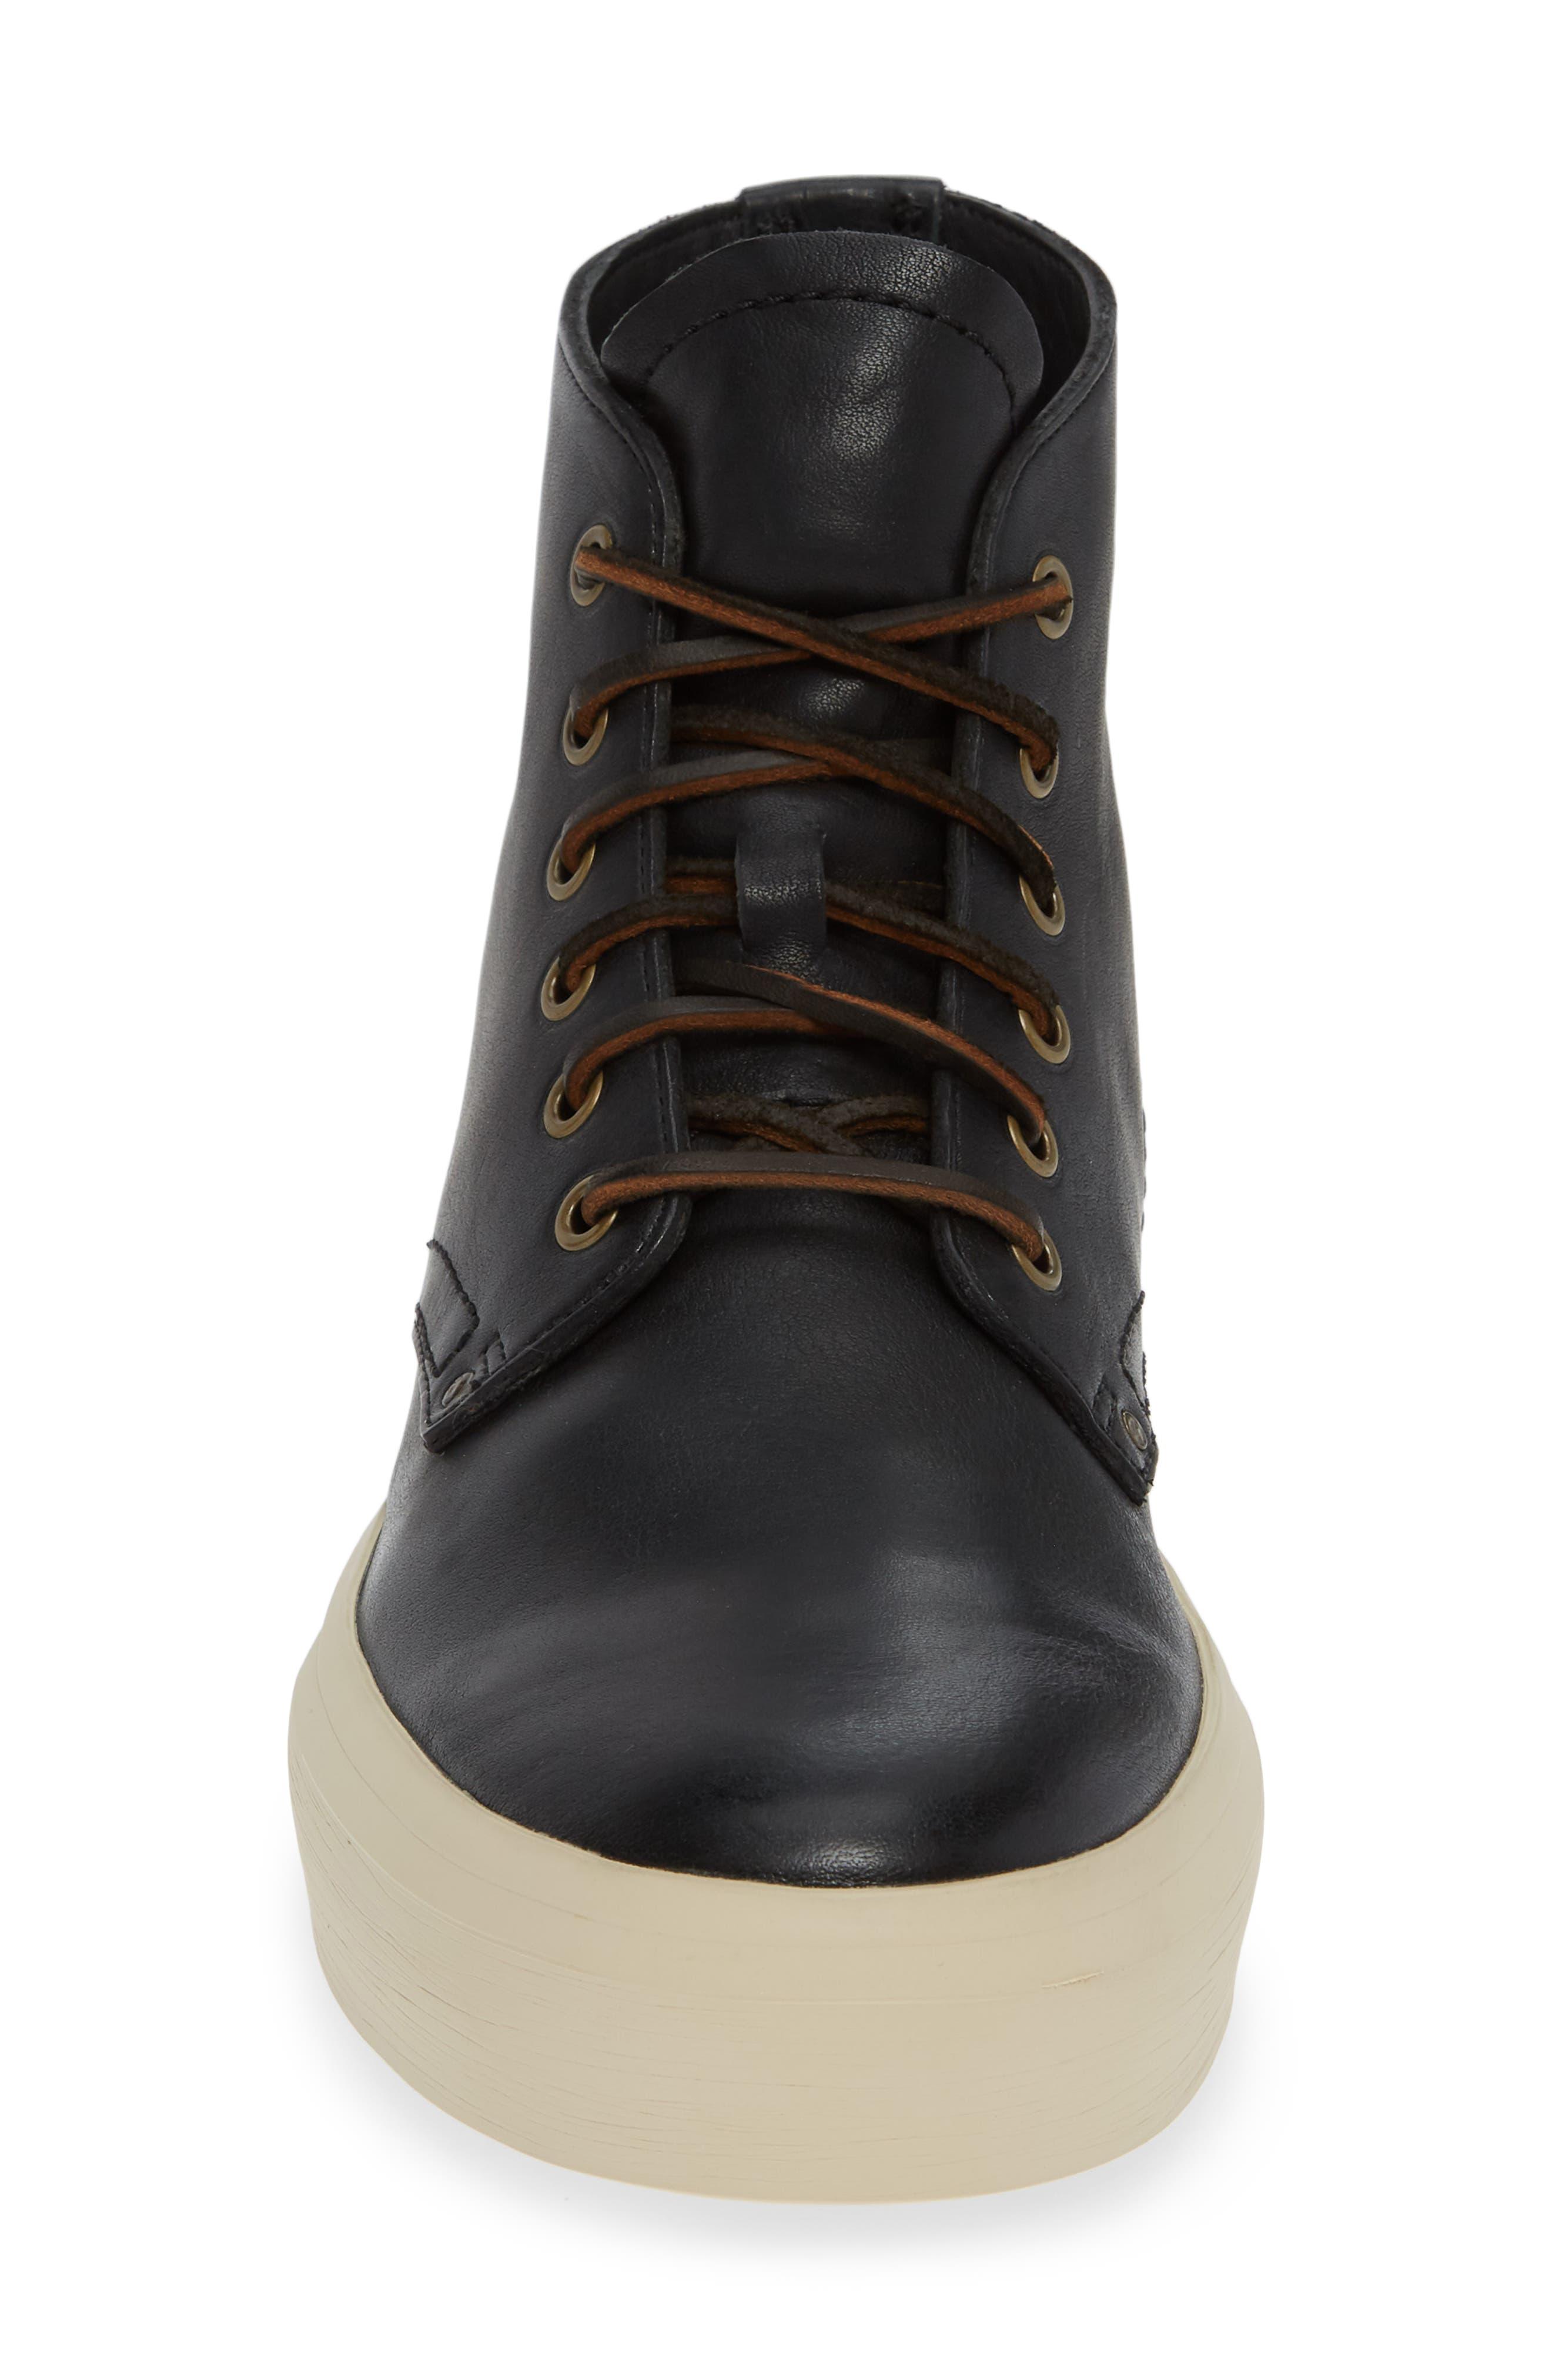 Beacon High Top Platform Sneaker,                             Alternate thumbnail 4, color,                             BLACK